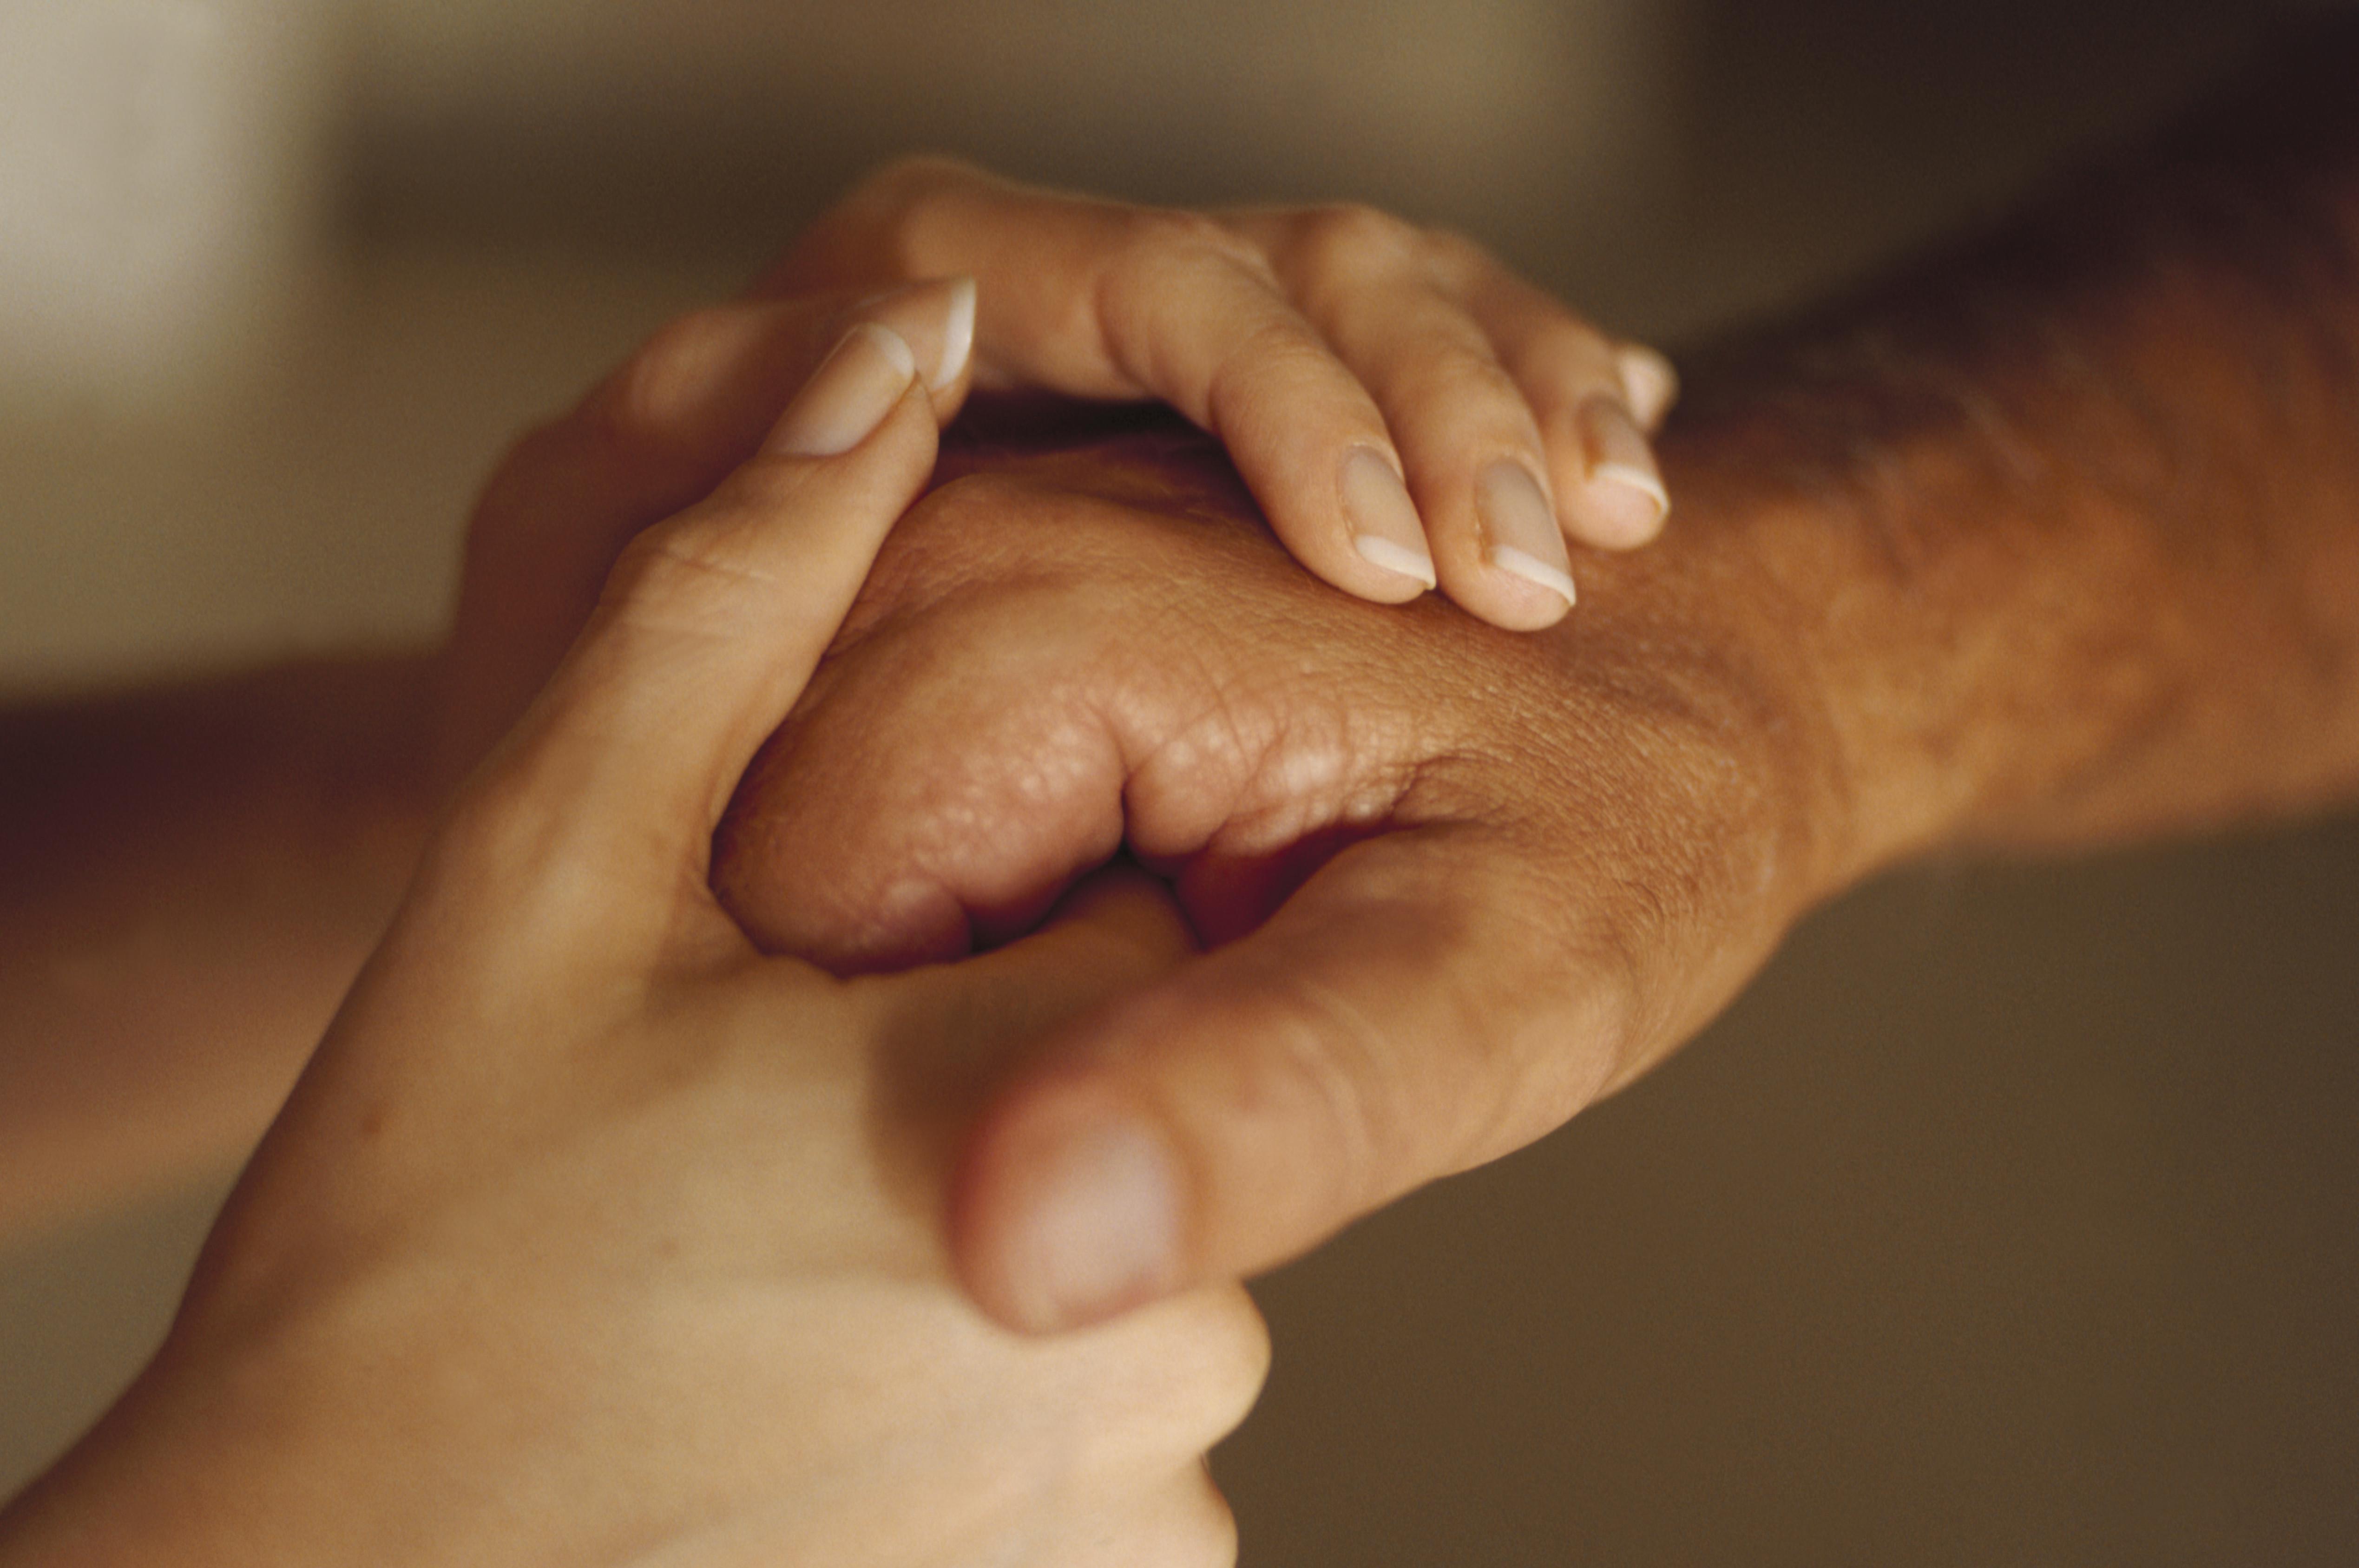 Woman Comforting Man